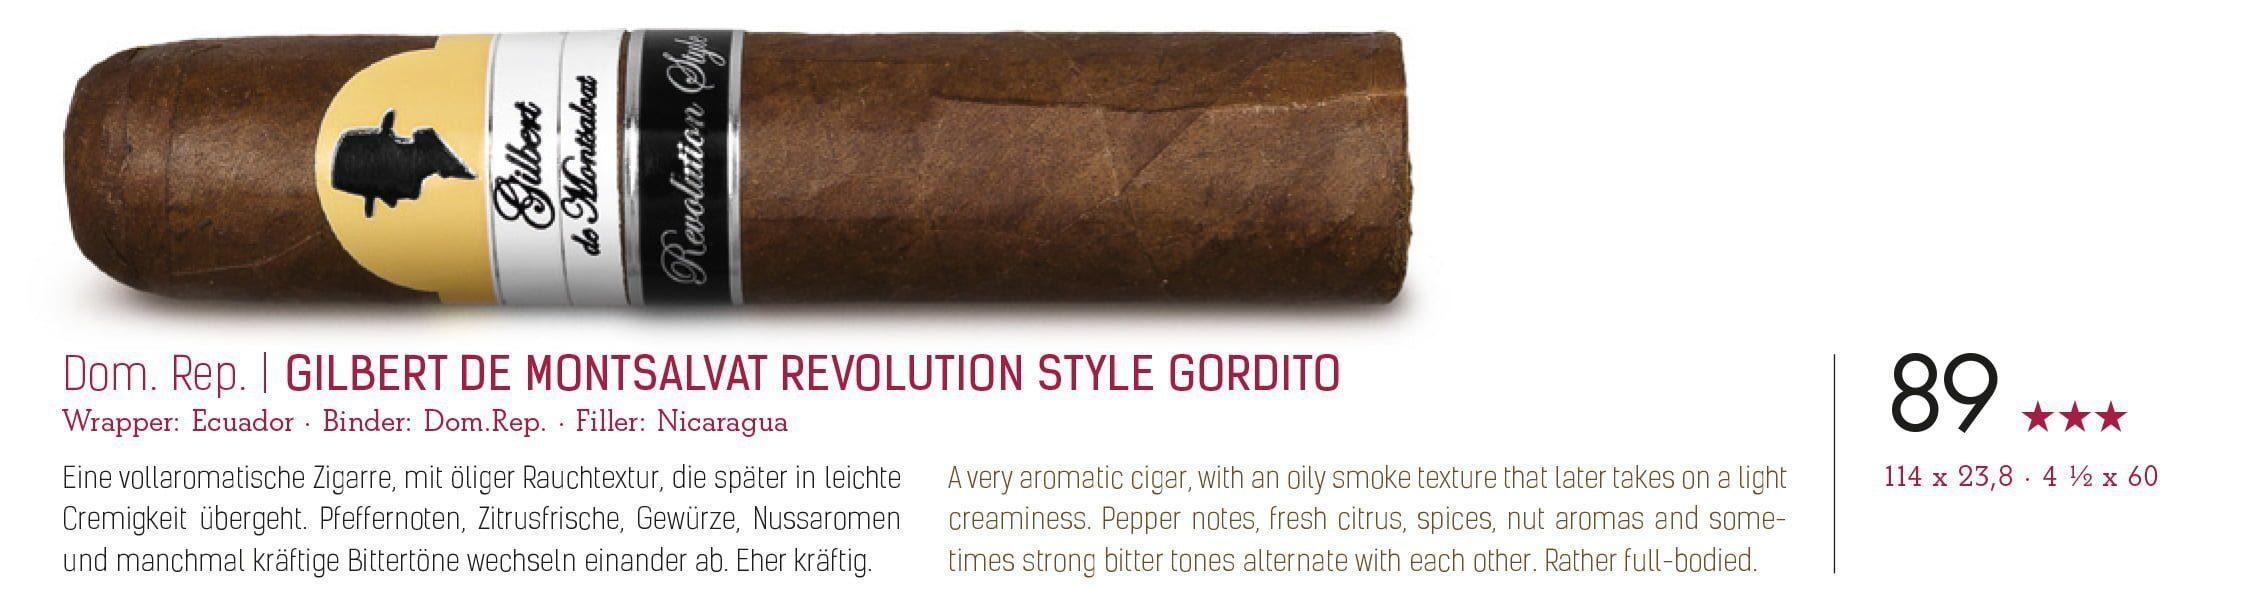 Gilbert de Montsalvat Revolution Style Gordito